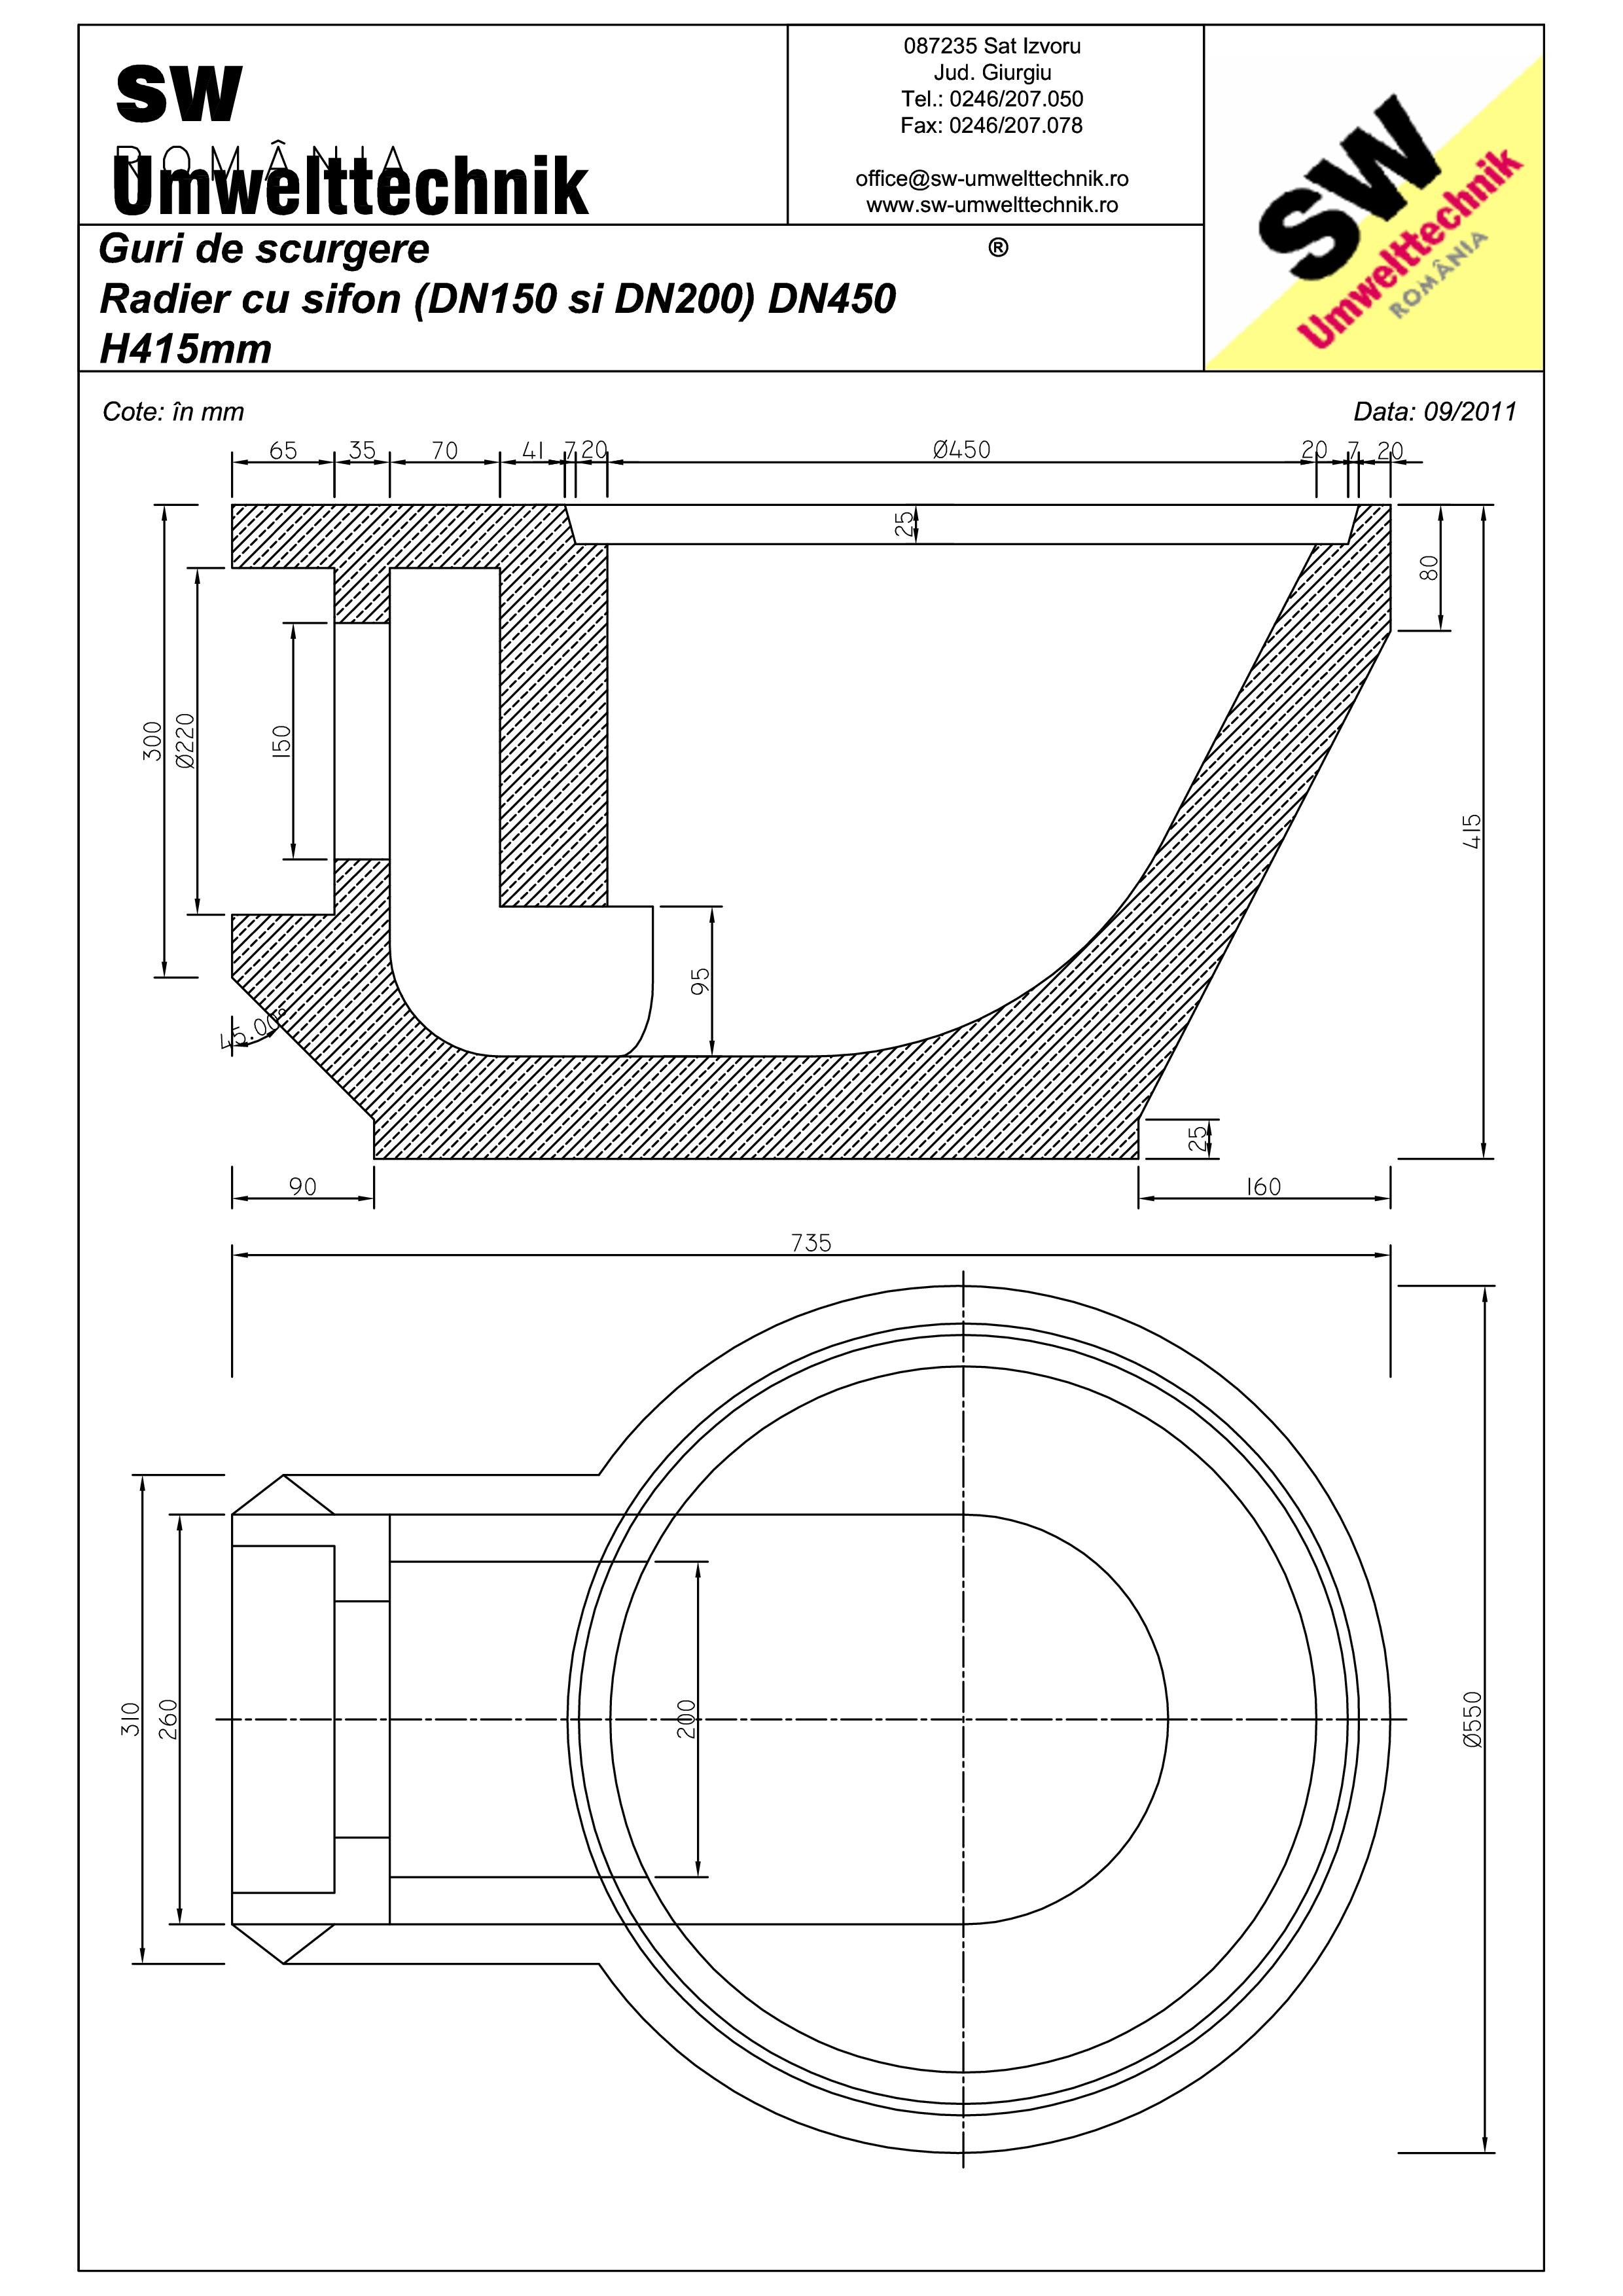 Pagina 1 - CAD-PDF Plan Austria - radier cu sifon (DN150 / DN200) DN450 SW UMWELTTECHNIK Detaliu de ...